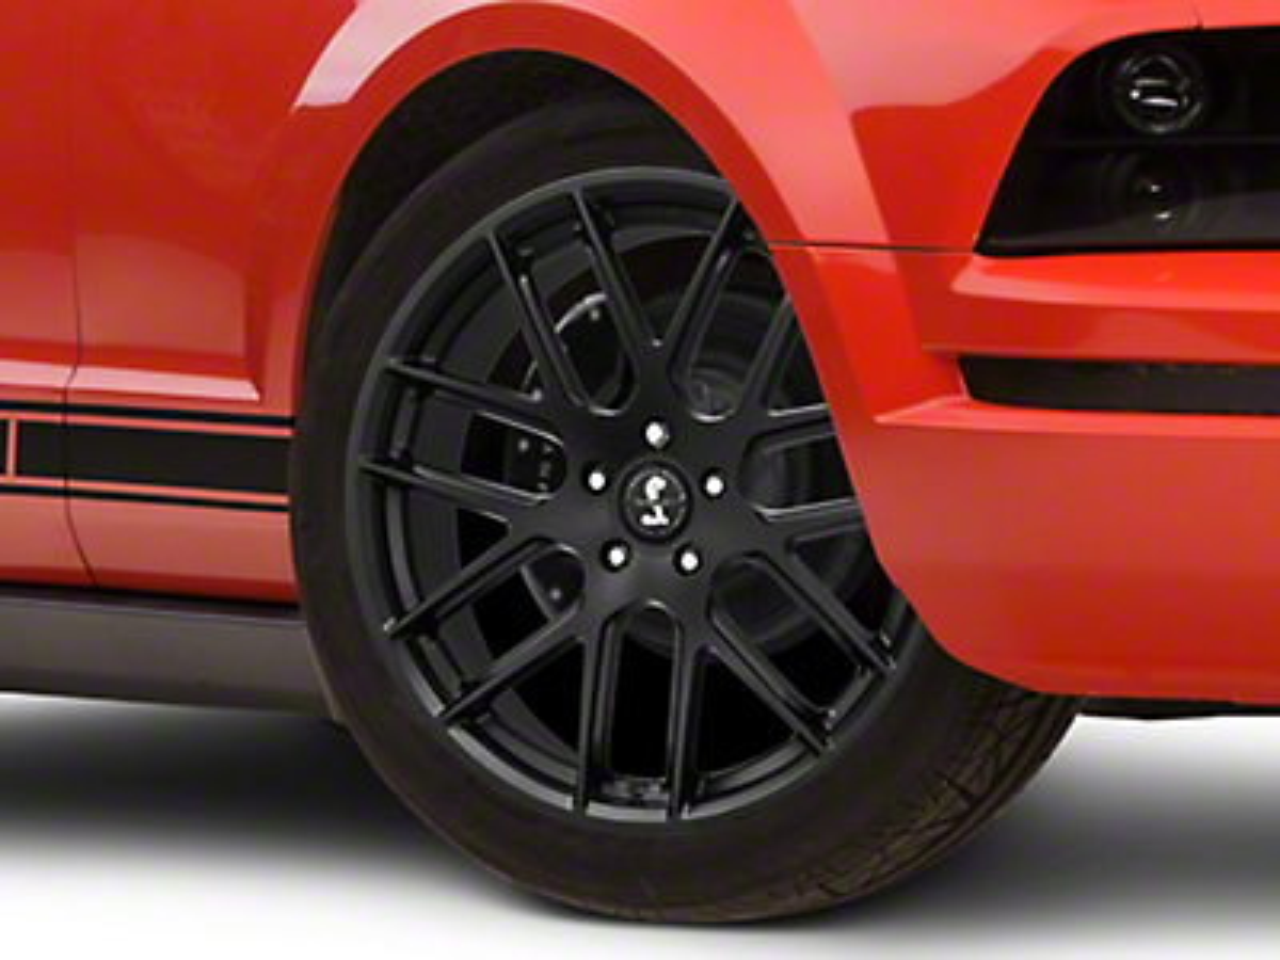 Shelby Style SB202 Satin Black Wheel - 20x9.5 (05-14 All)